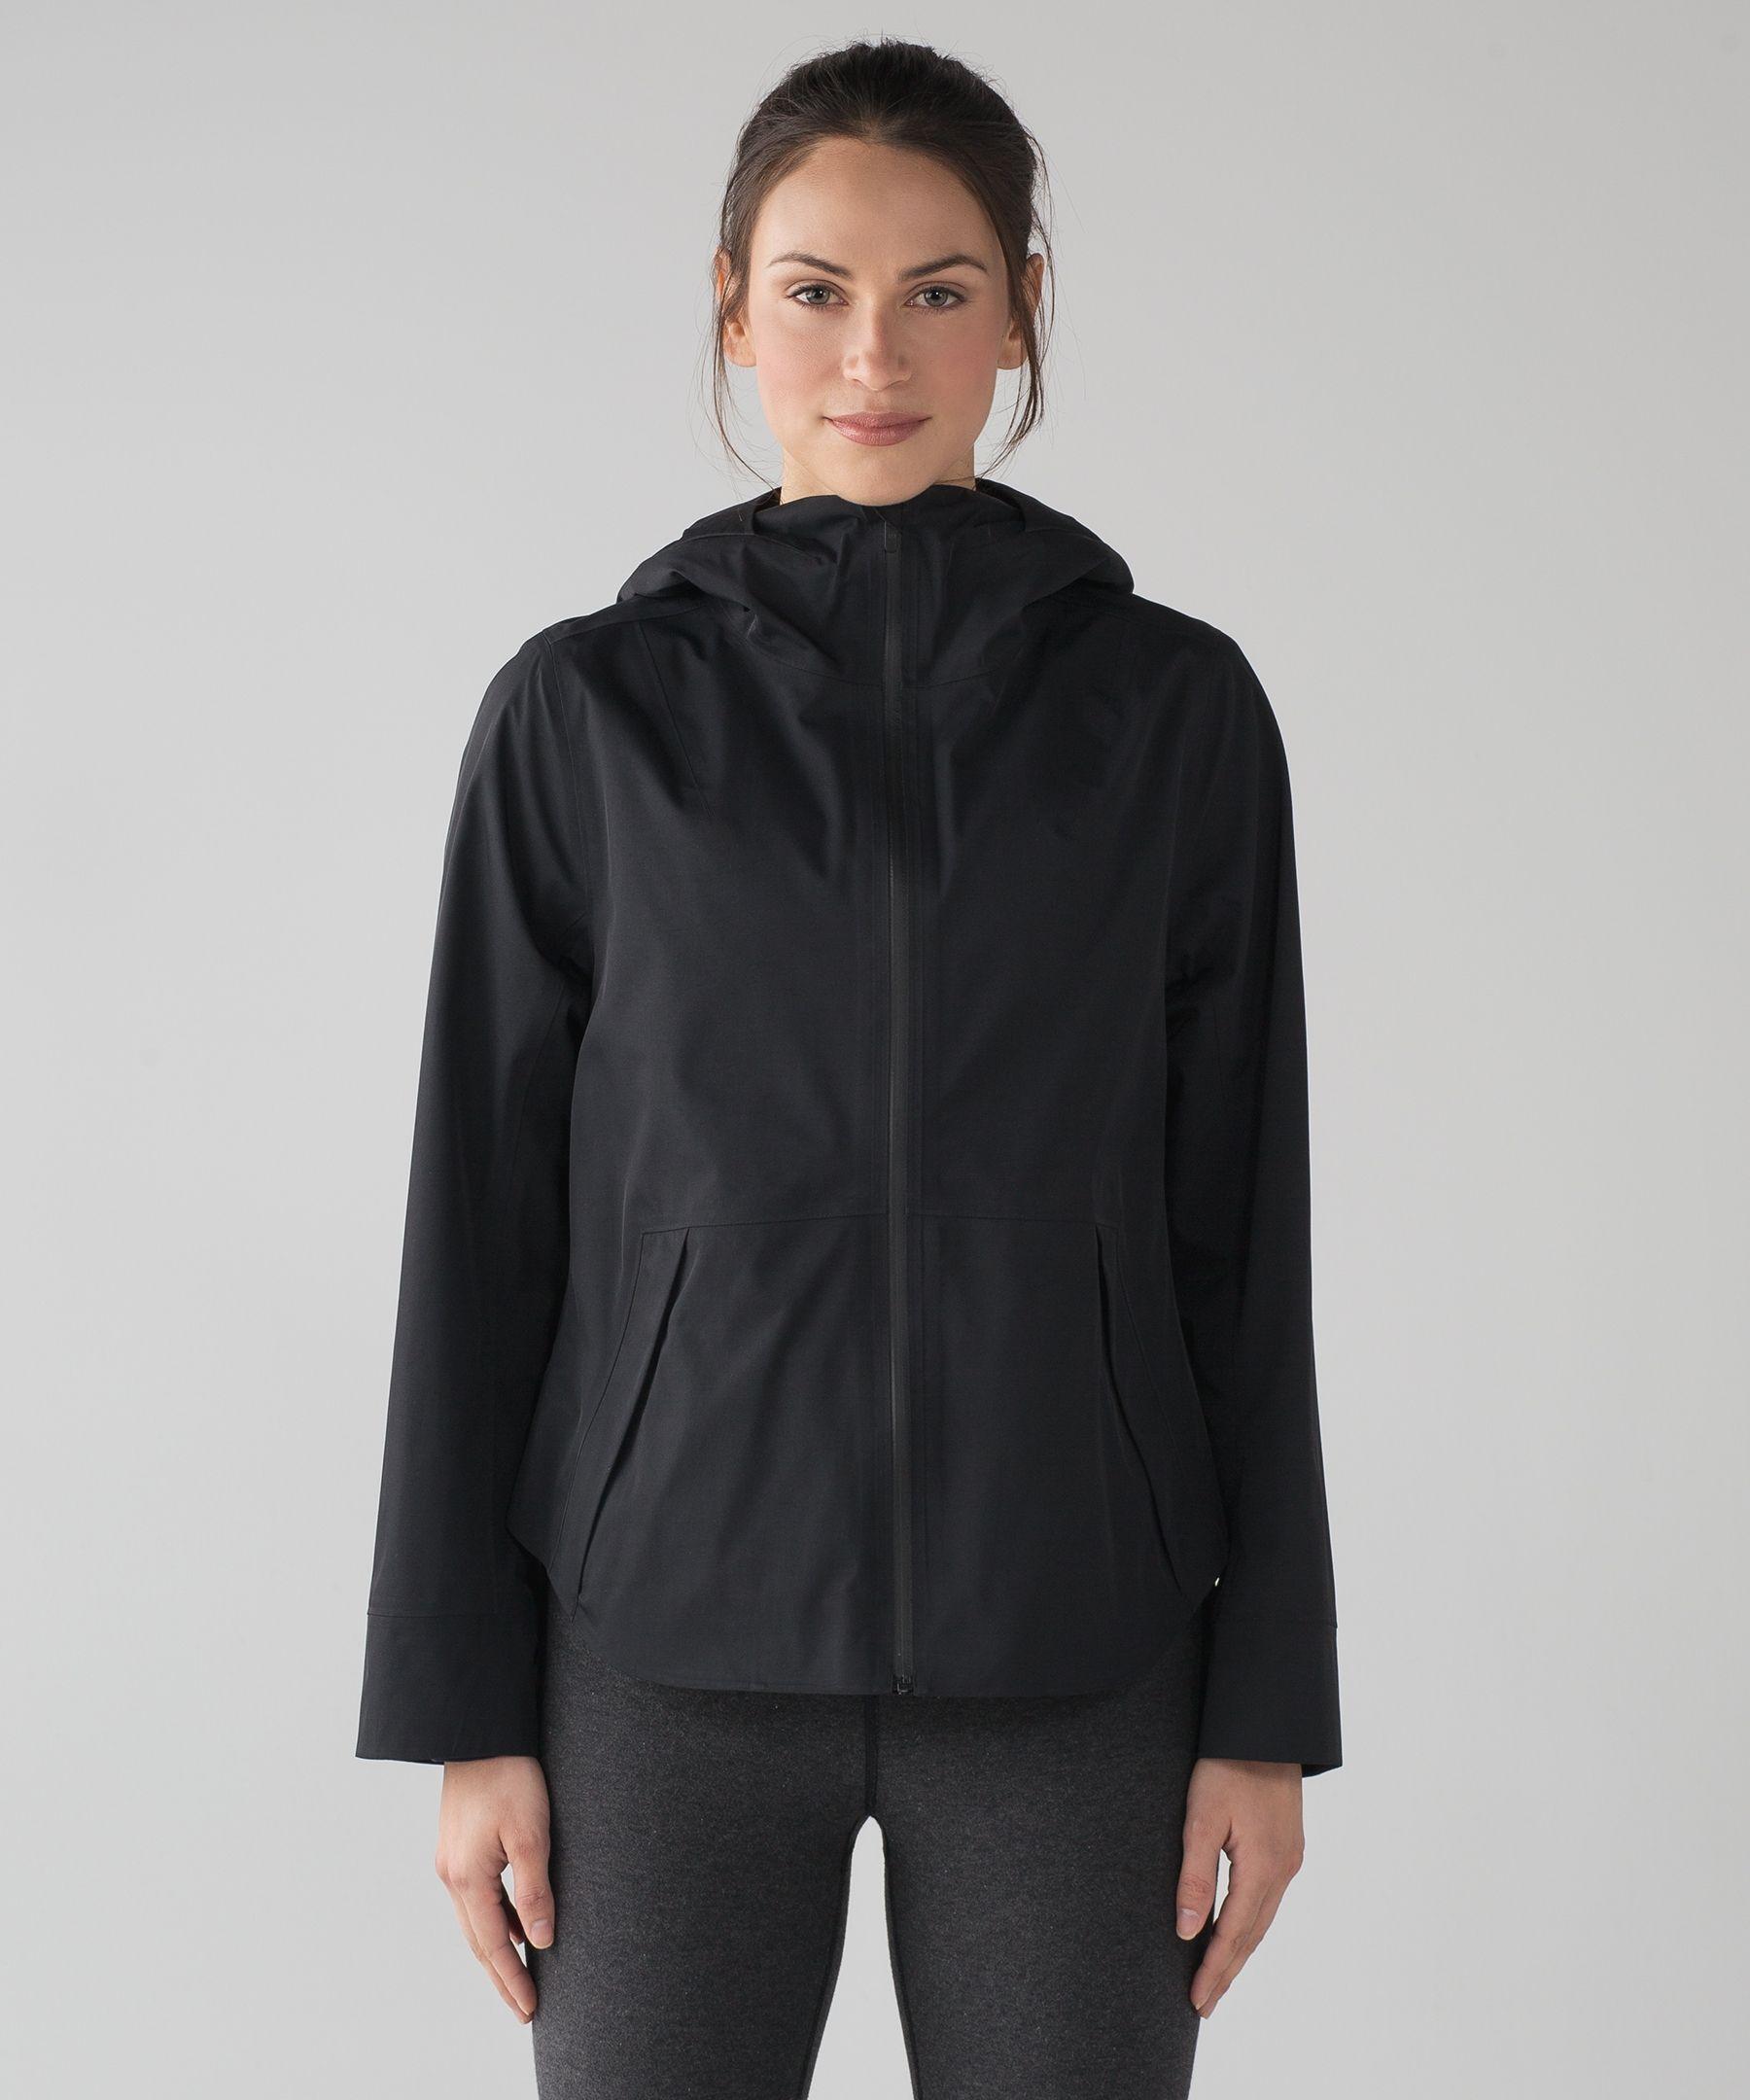 0de8114ecd Everyday Getaway Jacket | Products | Jackets, Outerwear women ...